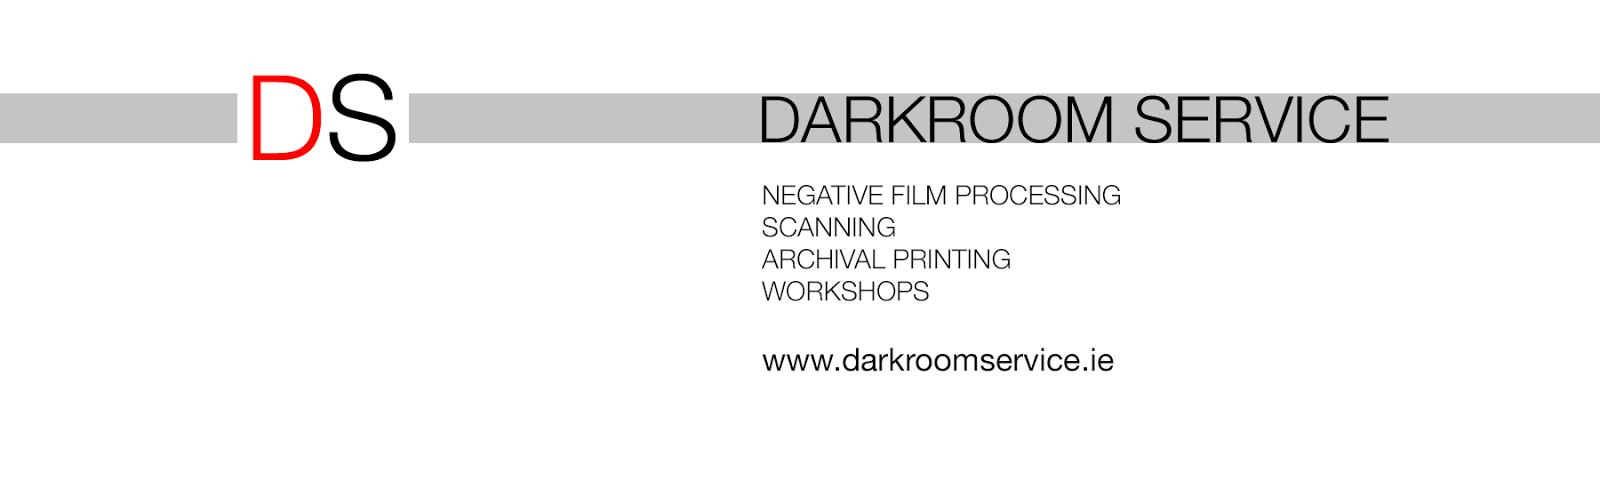 Darkroom Service